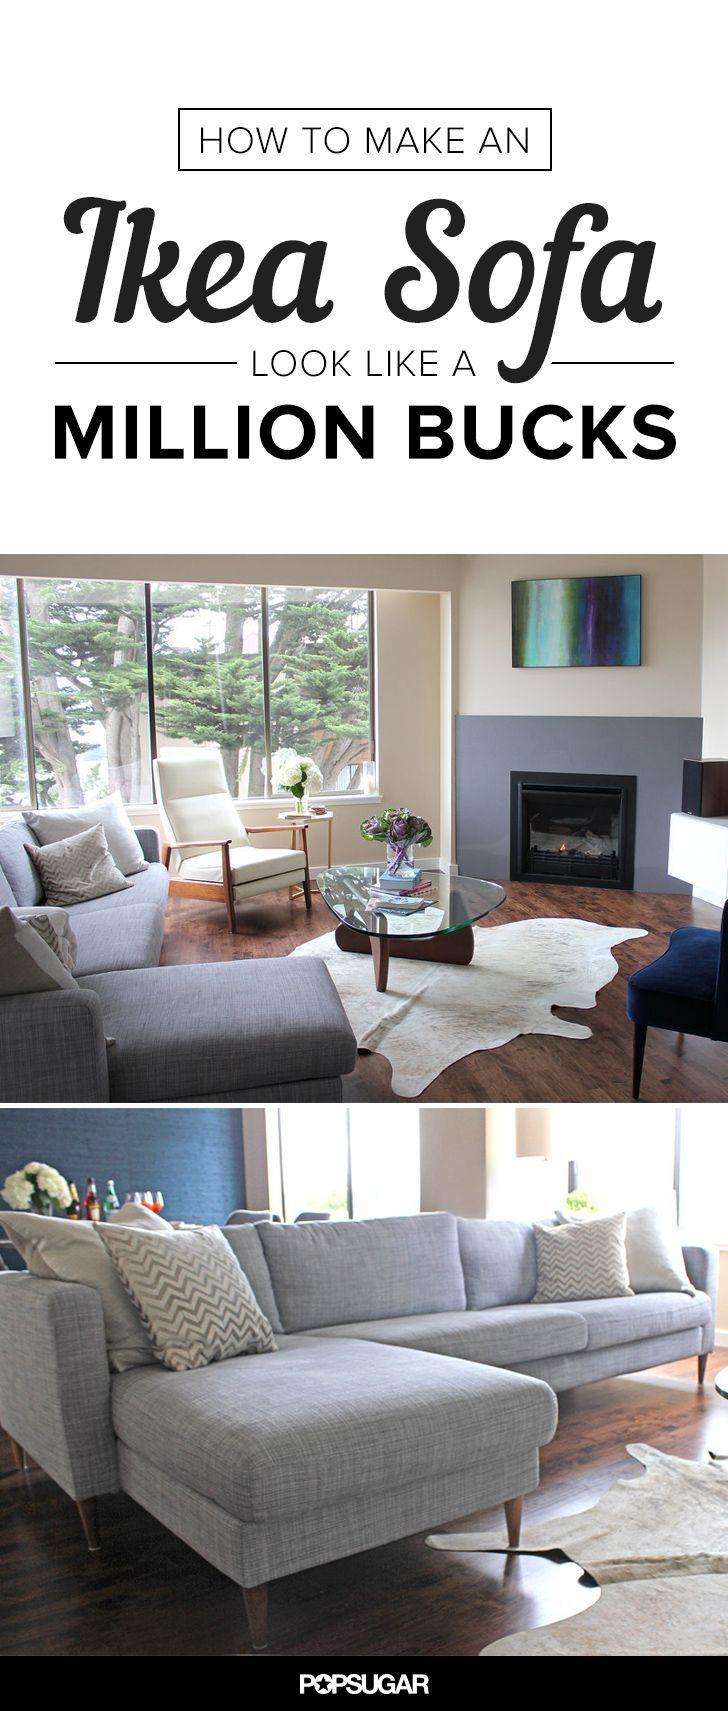 A simple hack that makes an ikea sofa look like a million bucks